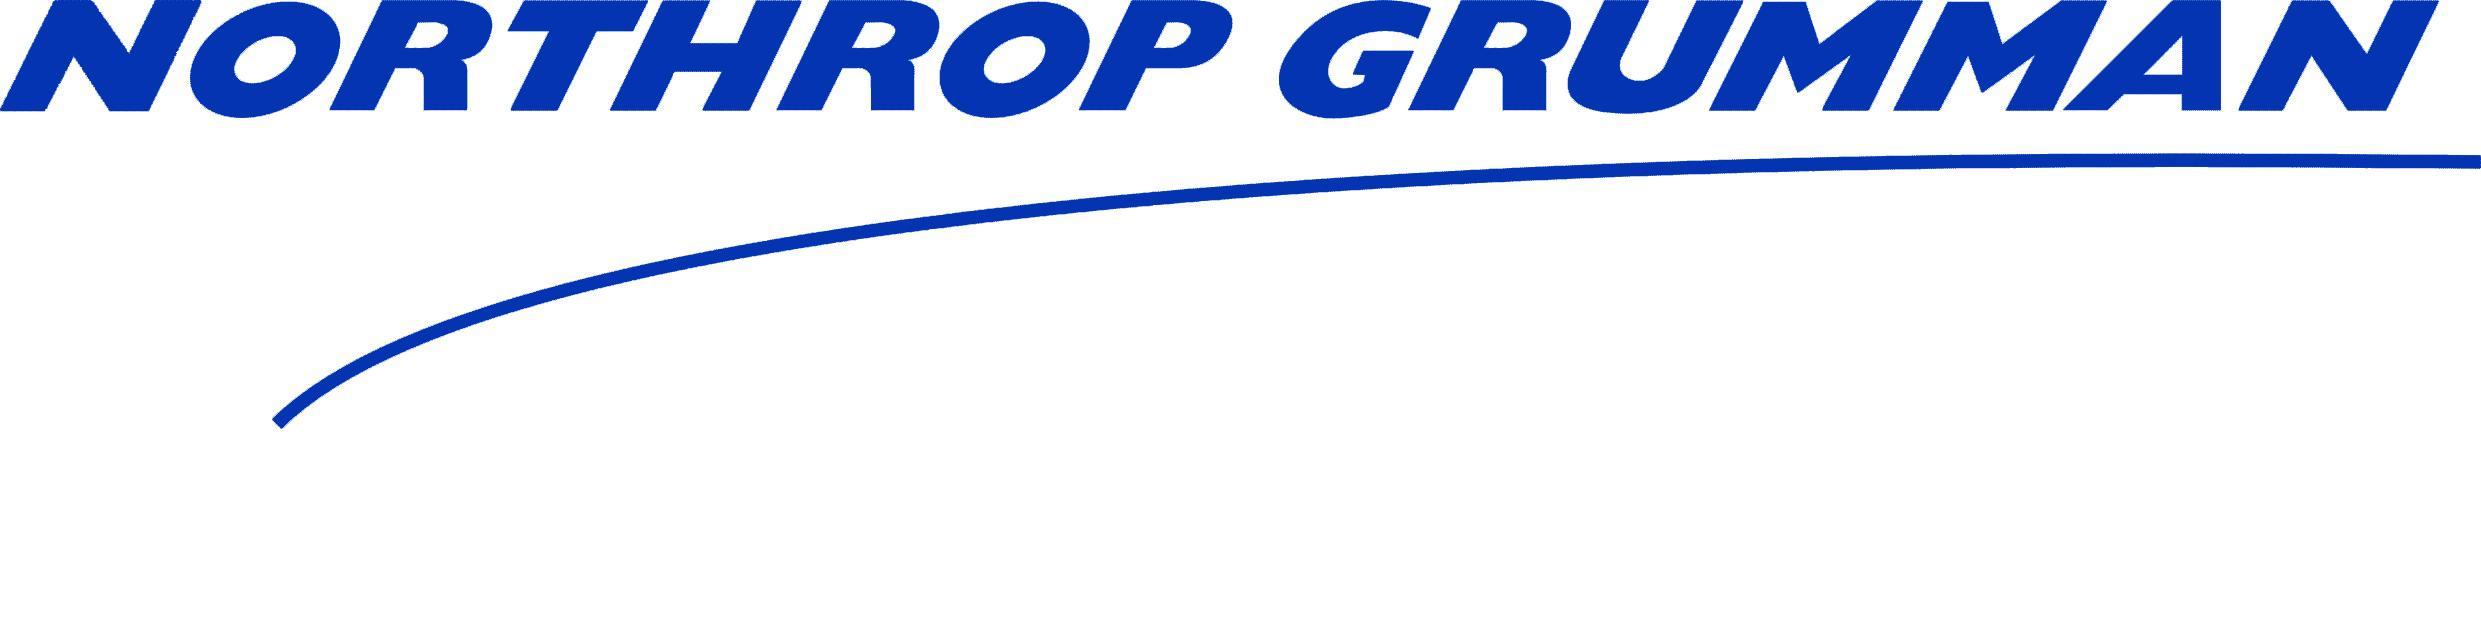 NorthropGrumman-logo